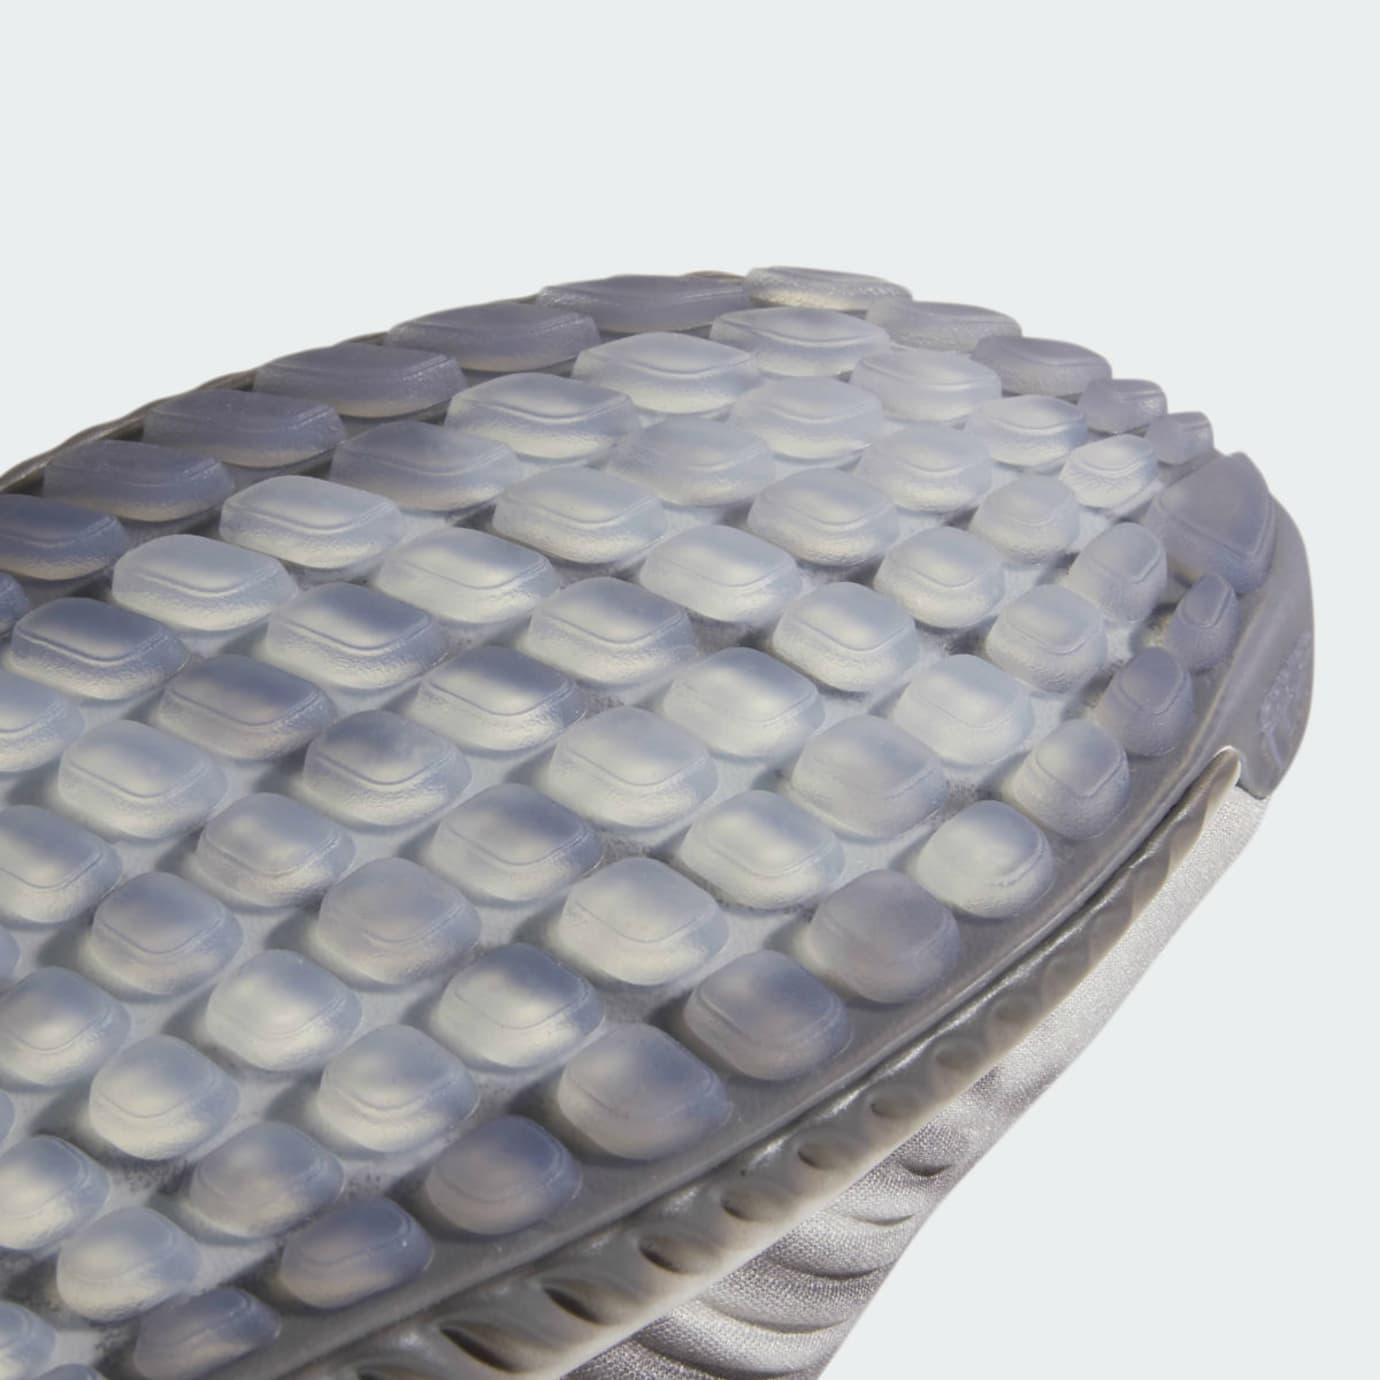 ff8d8b5635f Adidas Adicross Bounce Niuhi Shark Release Date AC8212 Outsole